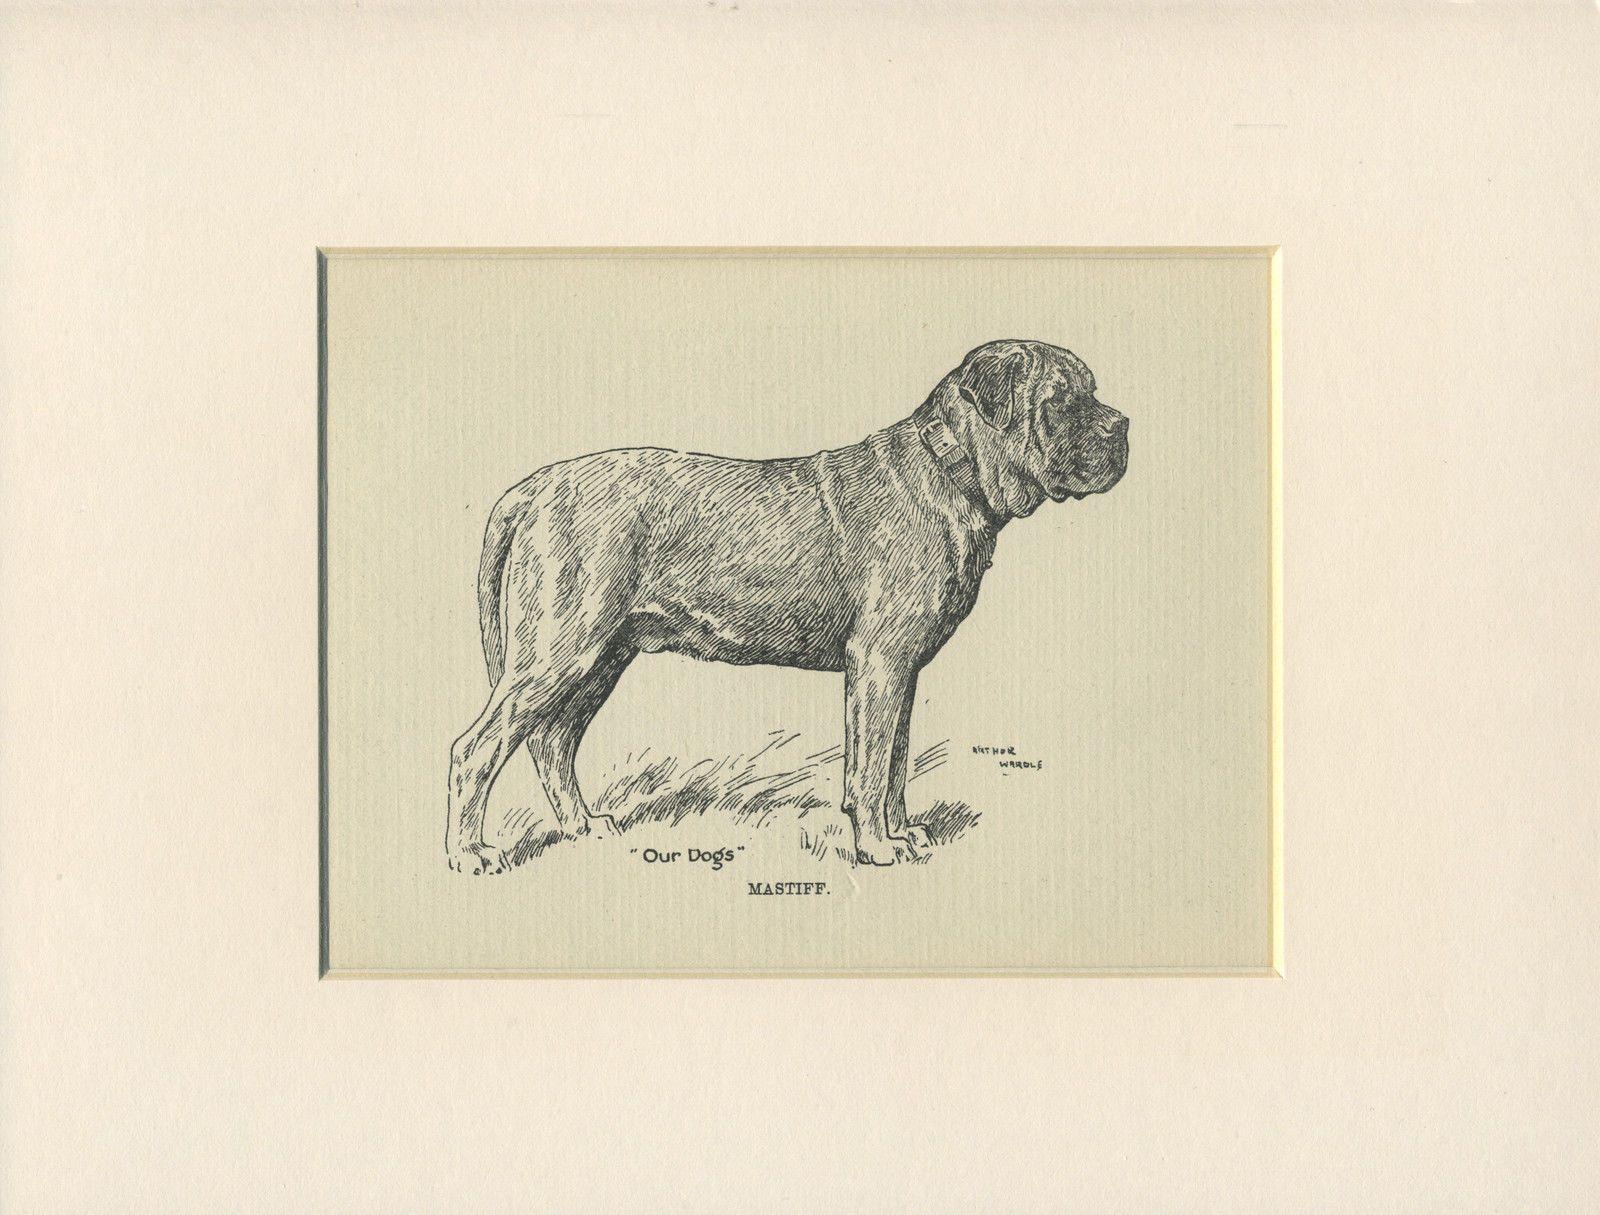 MASTIFF OLD ANTIQUE 1912 DOG PRINT by ARTHUR WARDLE READY MOUNTED